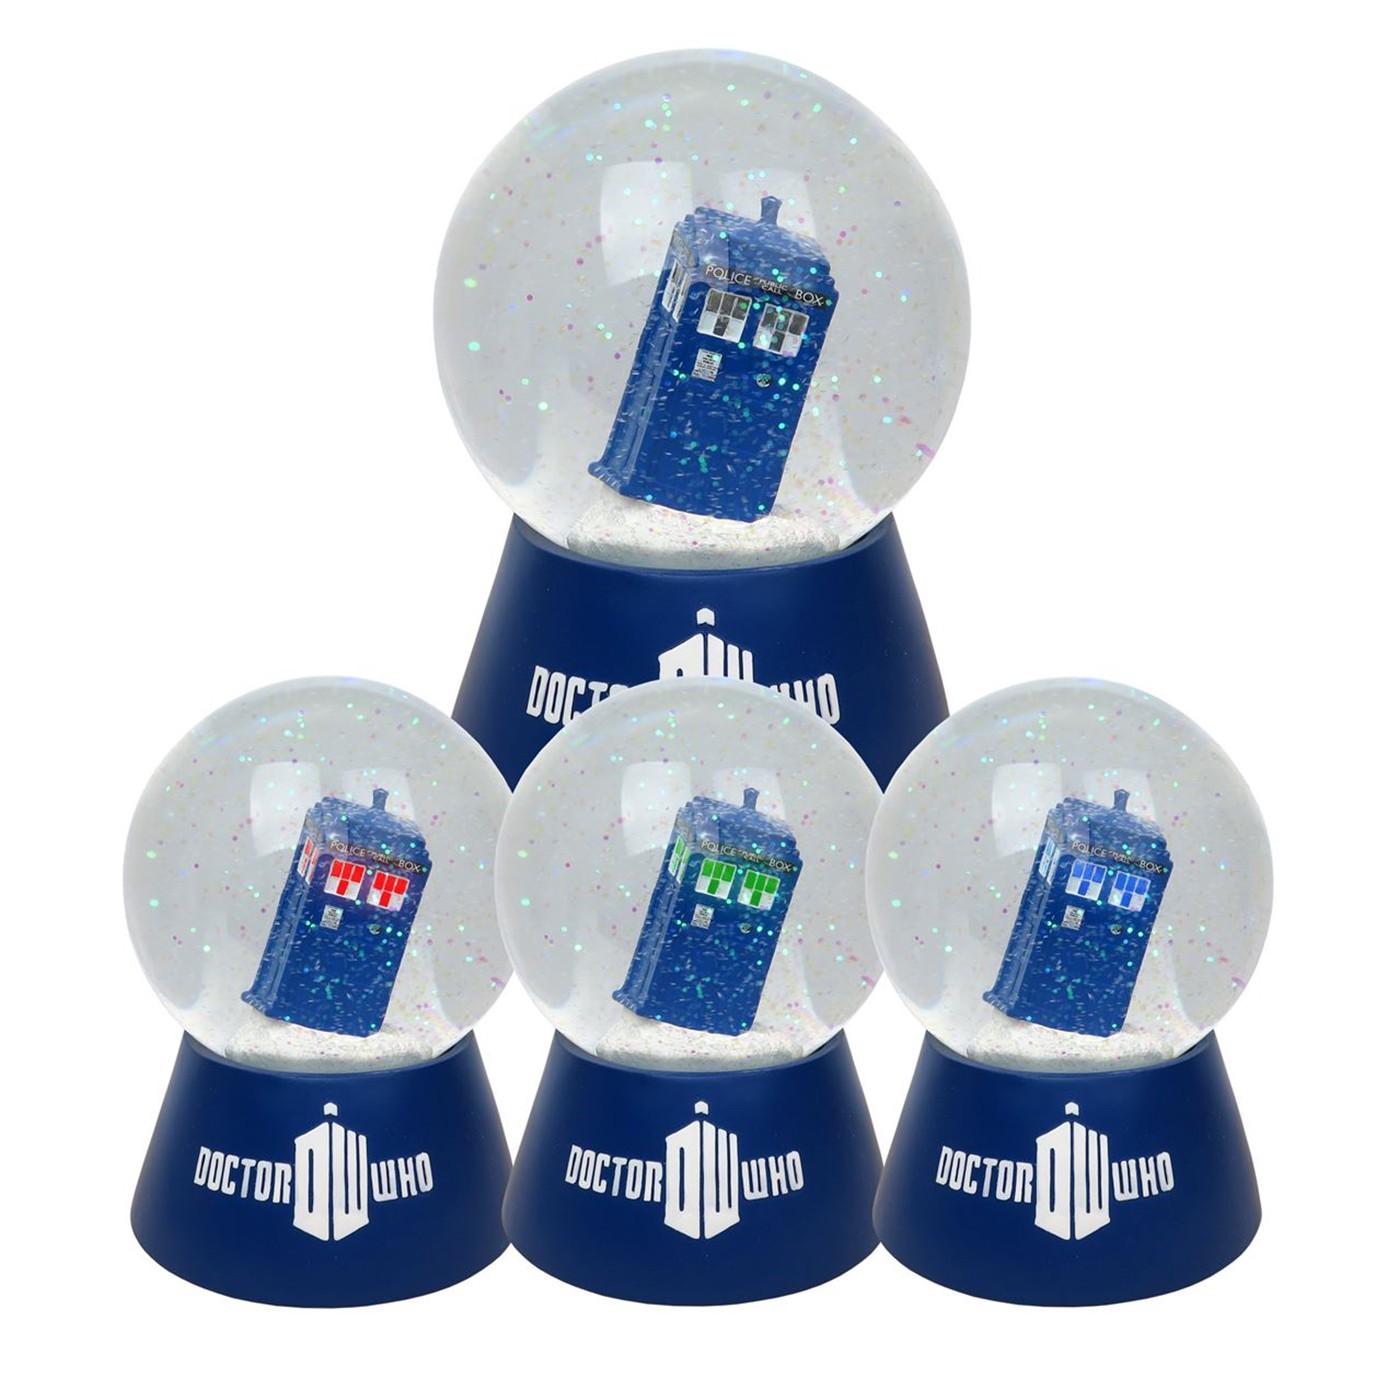 Doctor Who Tardis Lighted Snow Globe